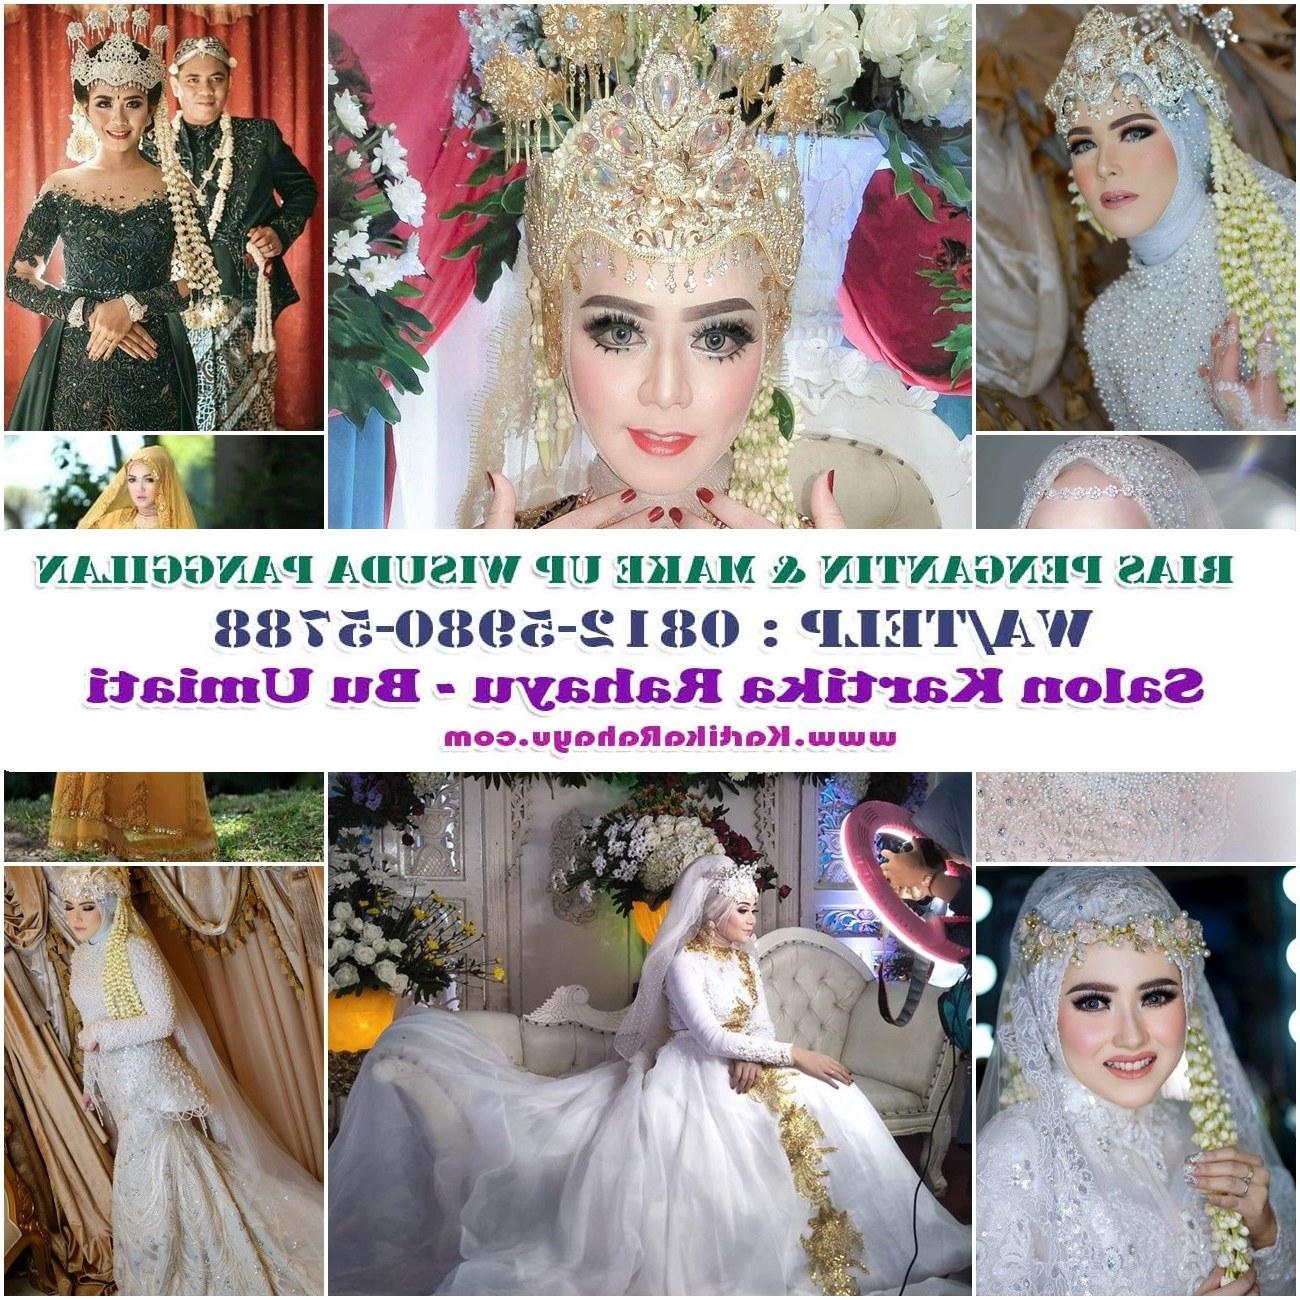 Ide Sewa Baju Pengantin Muslimah Bandung 3id6 Make Up Wisuda Malang Kota Malang Jawa Timur